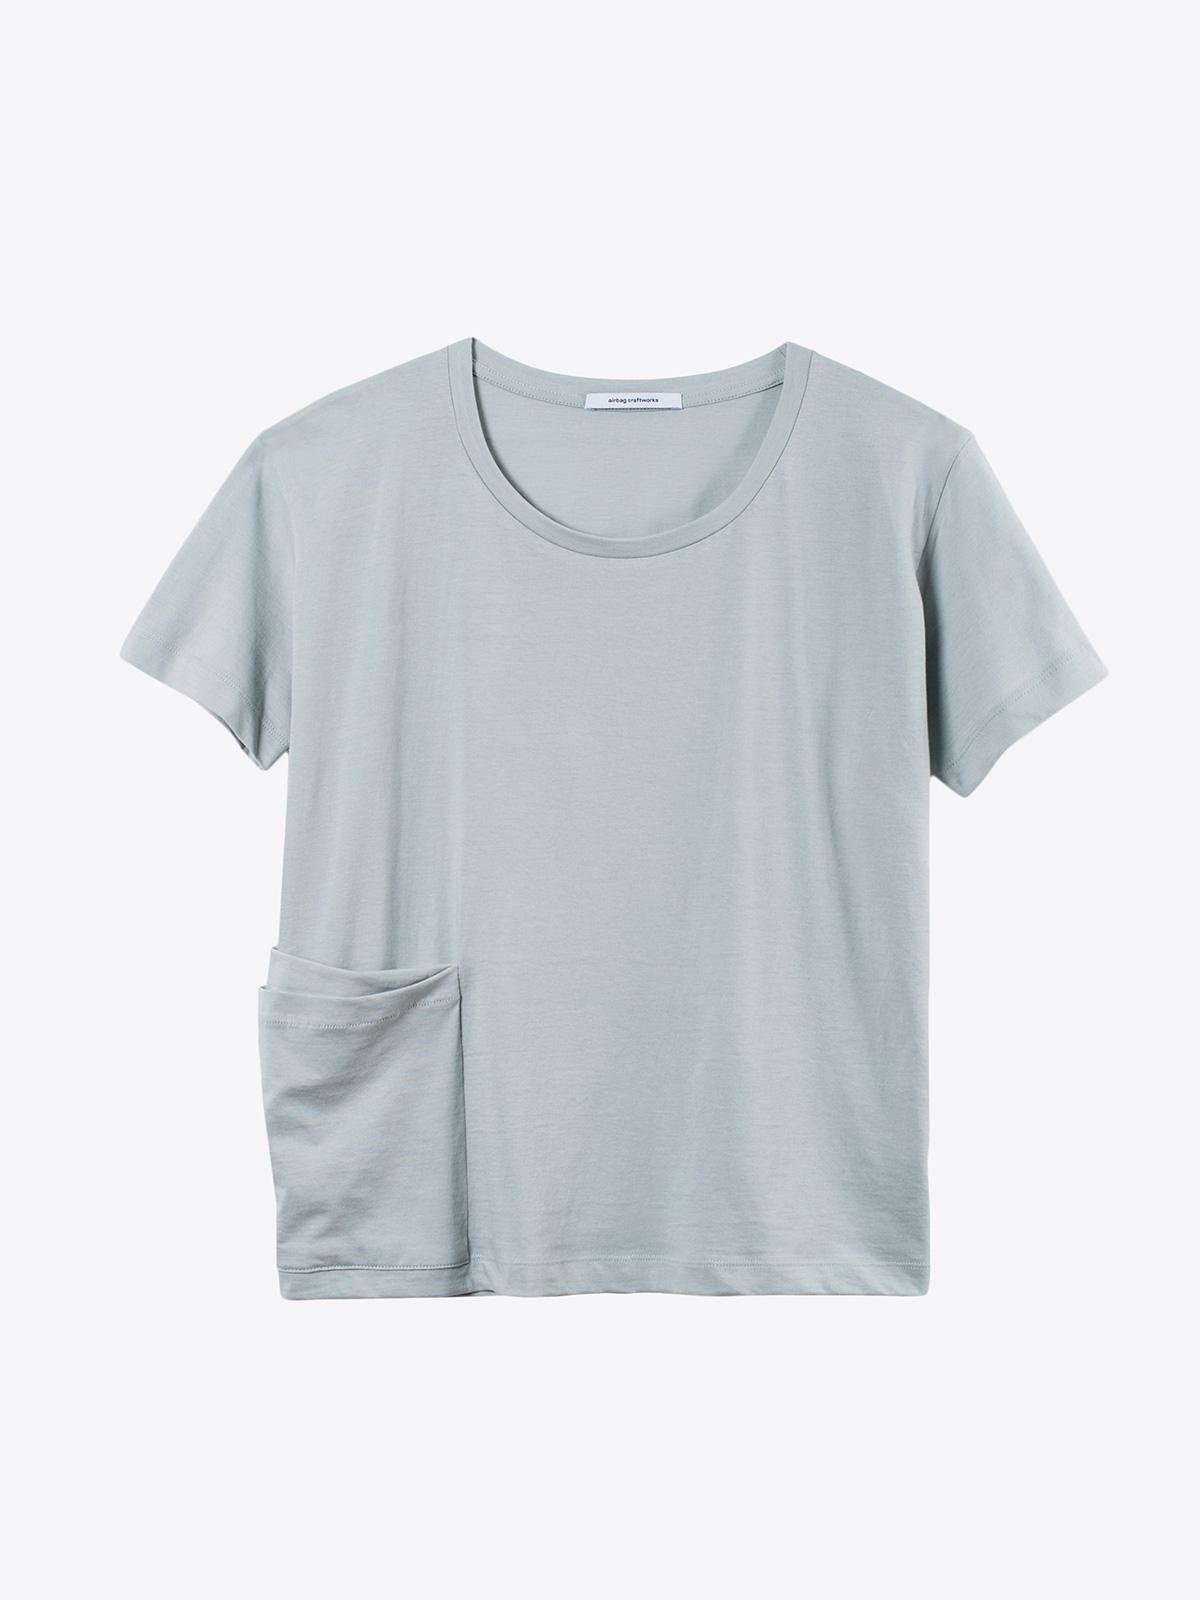 A2 pick pocket shirt | mirage grey